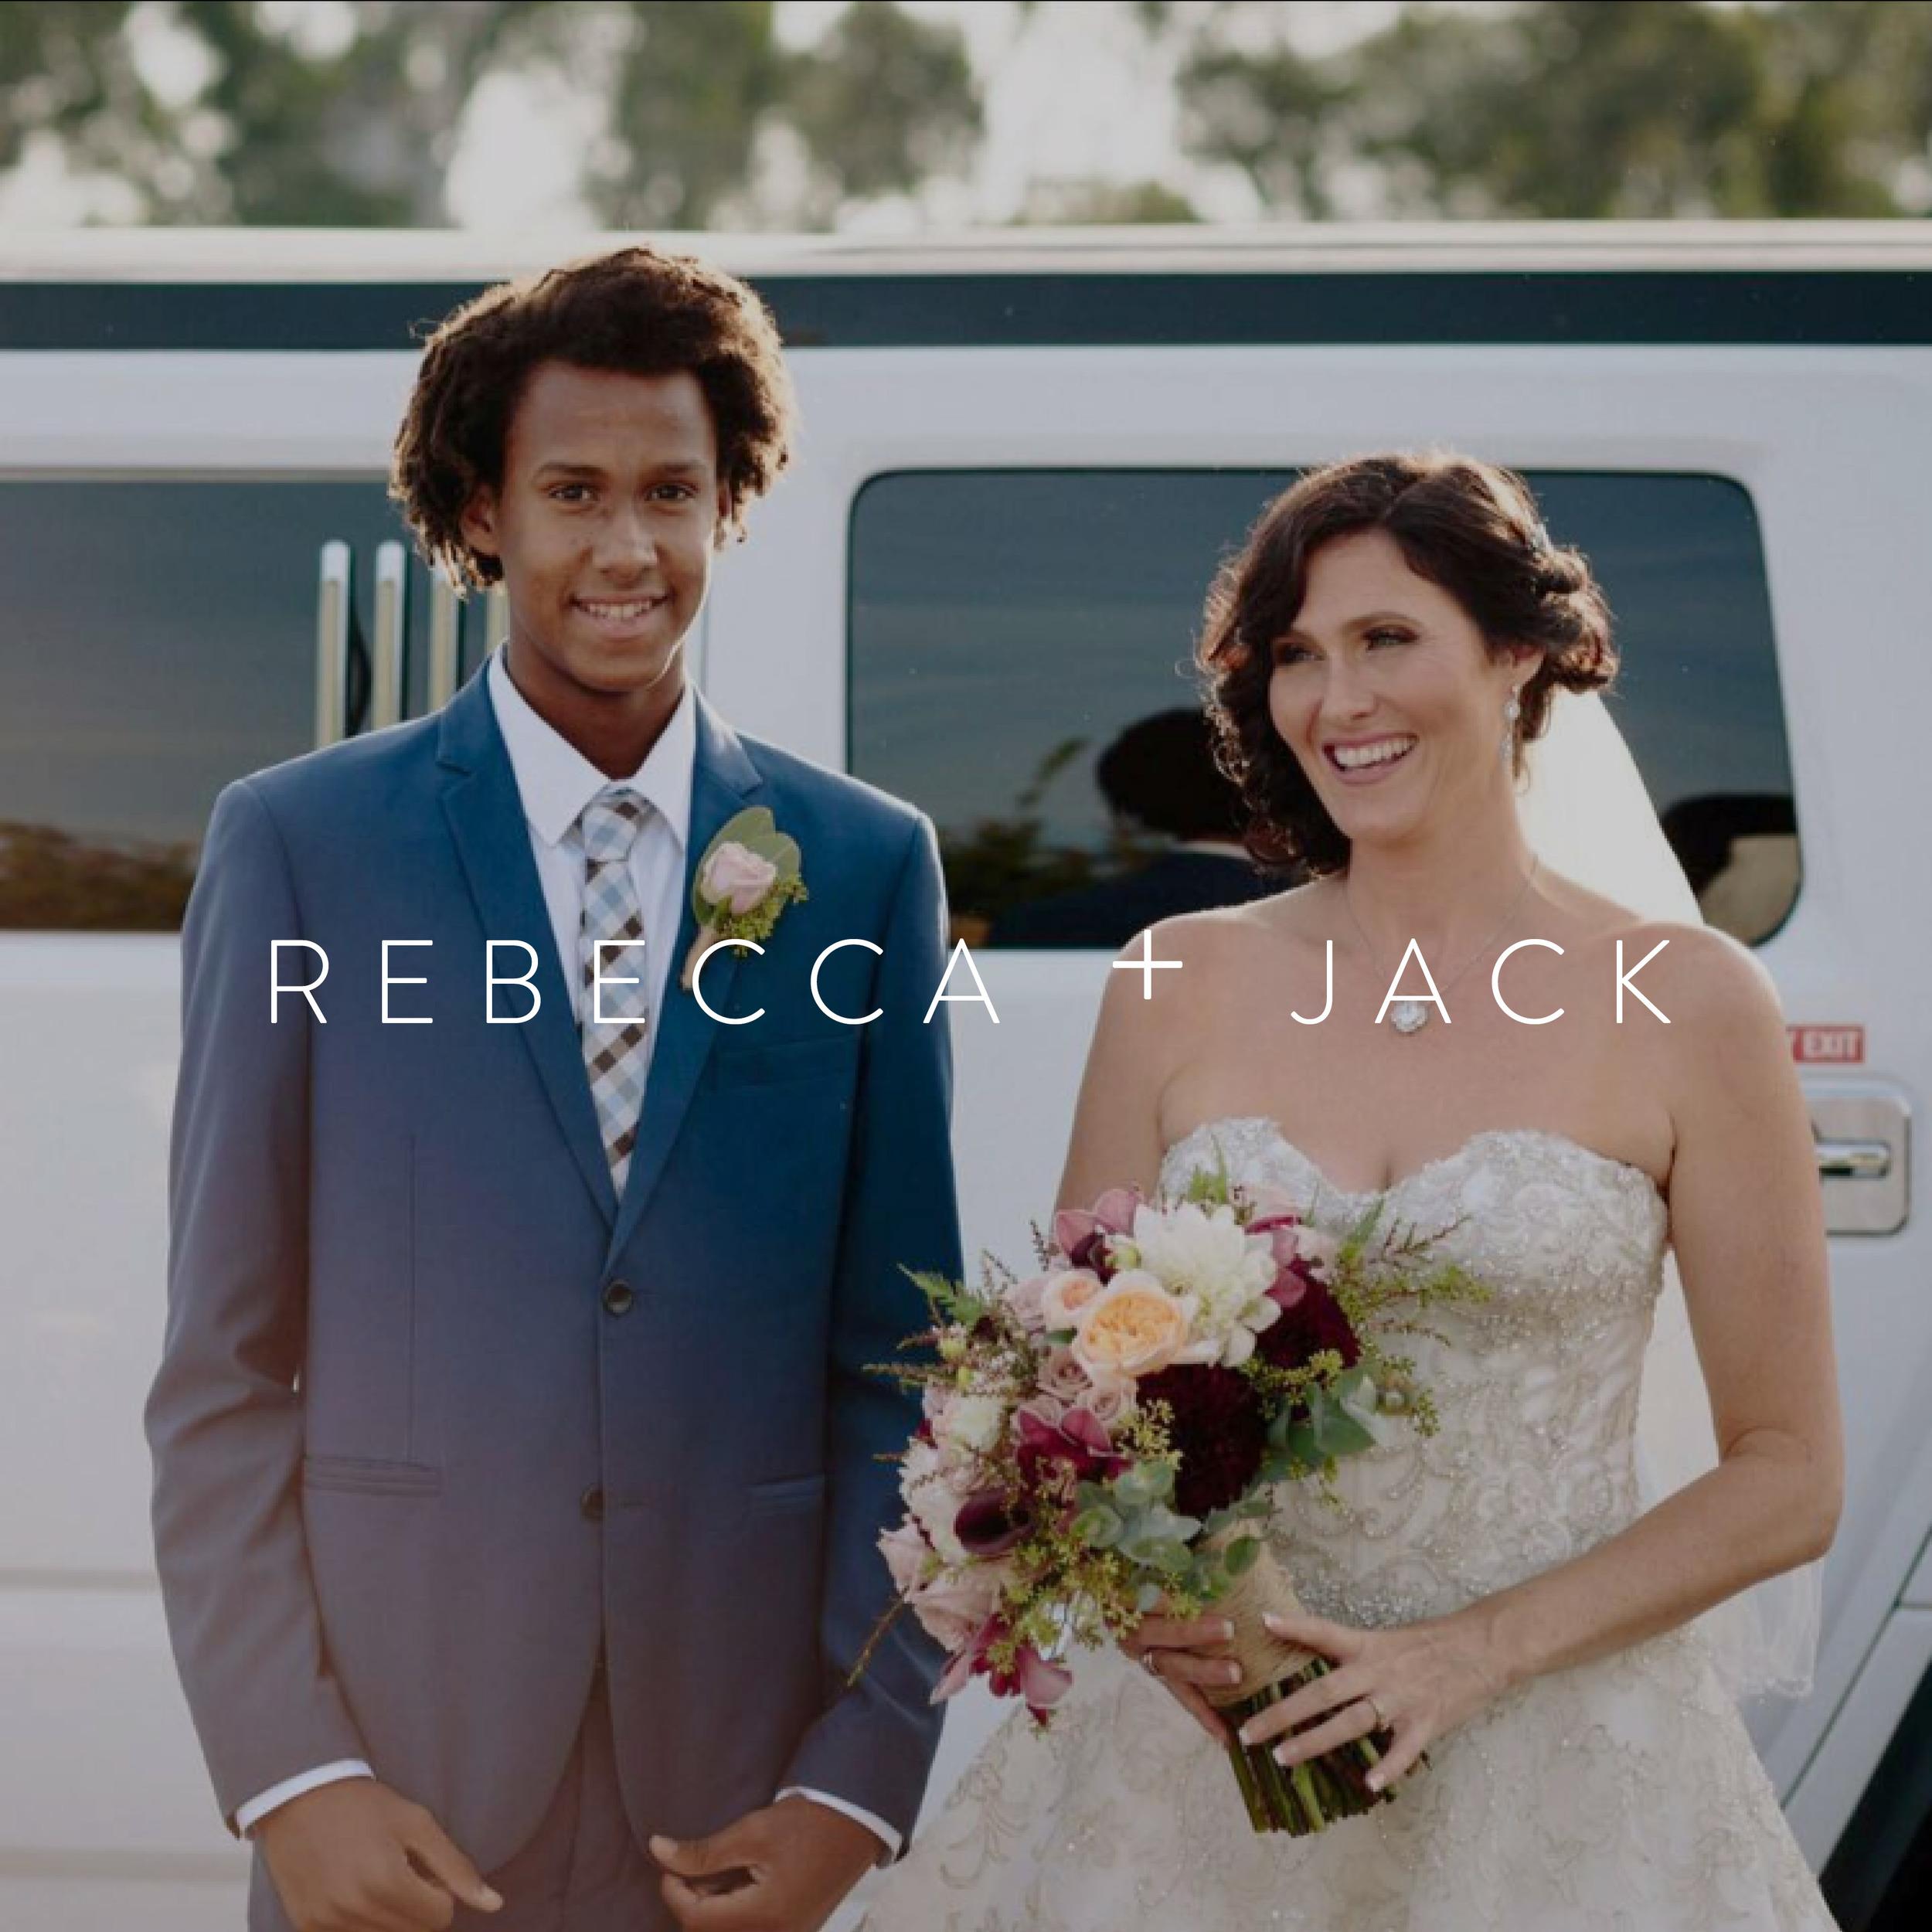 REBECCA + JACK